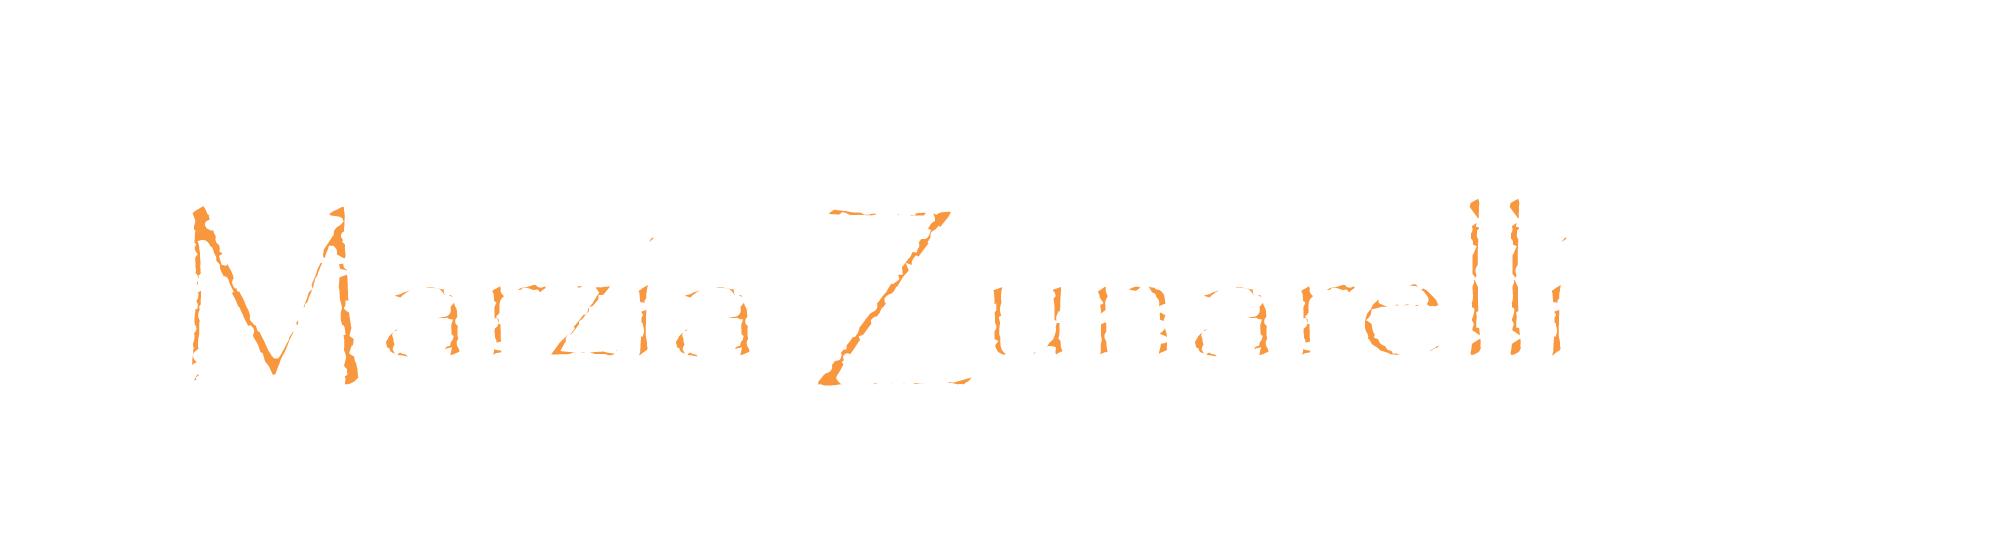 Marzia Zunarelli